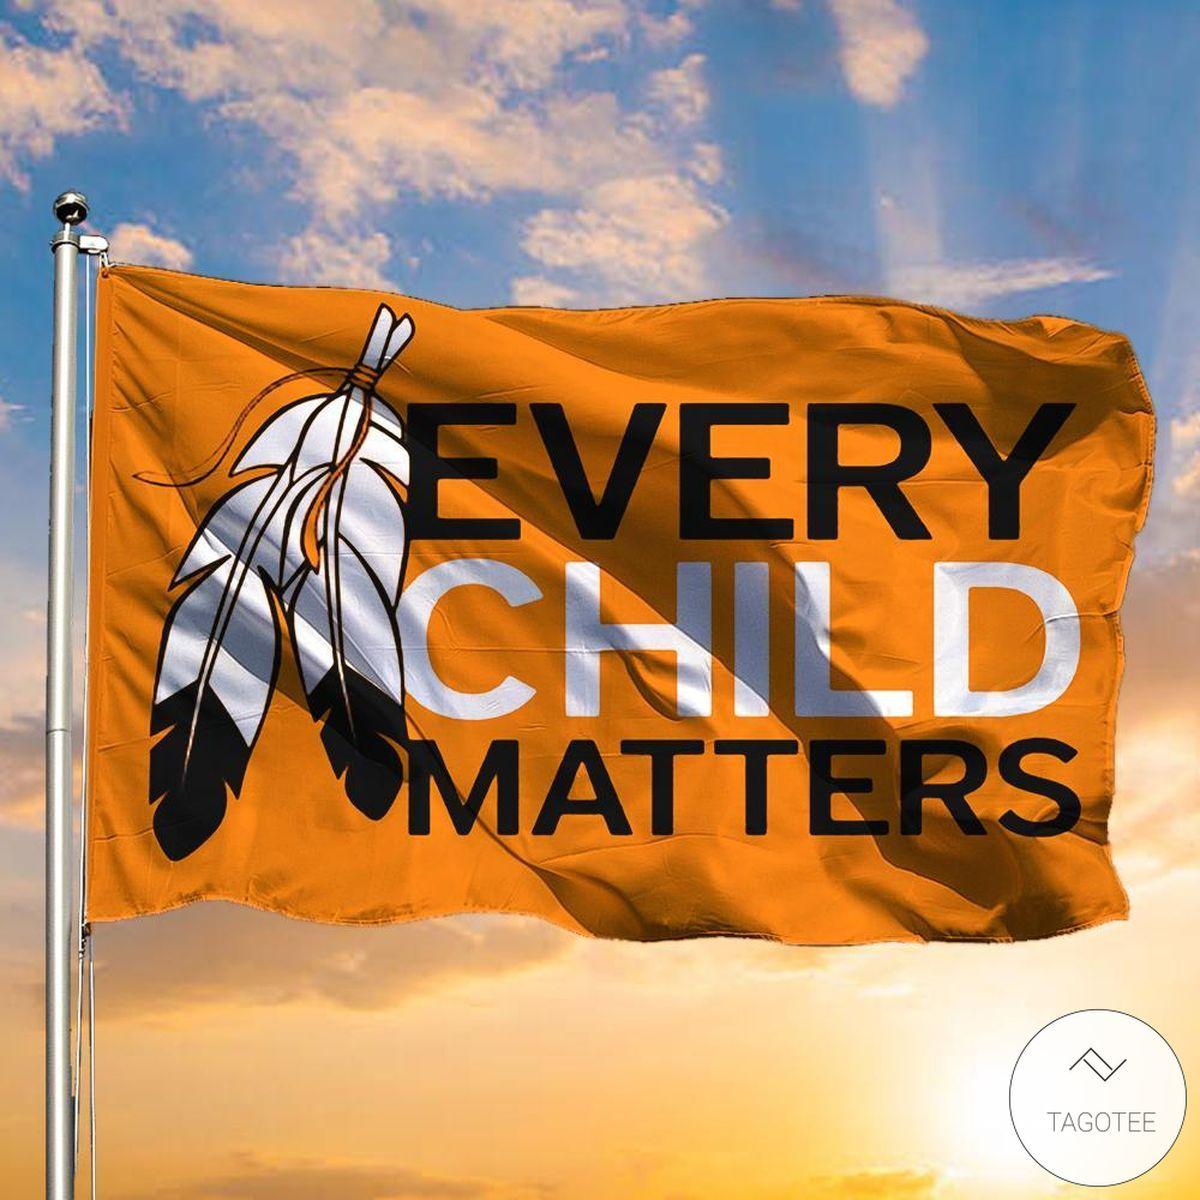 Every Child Matters Garden Flag